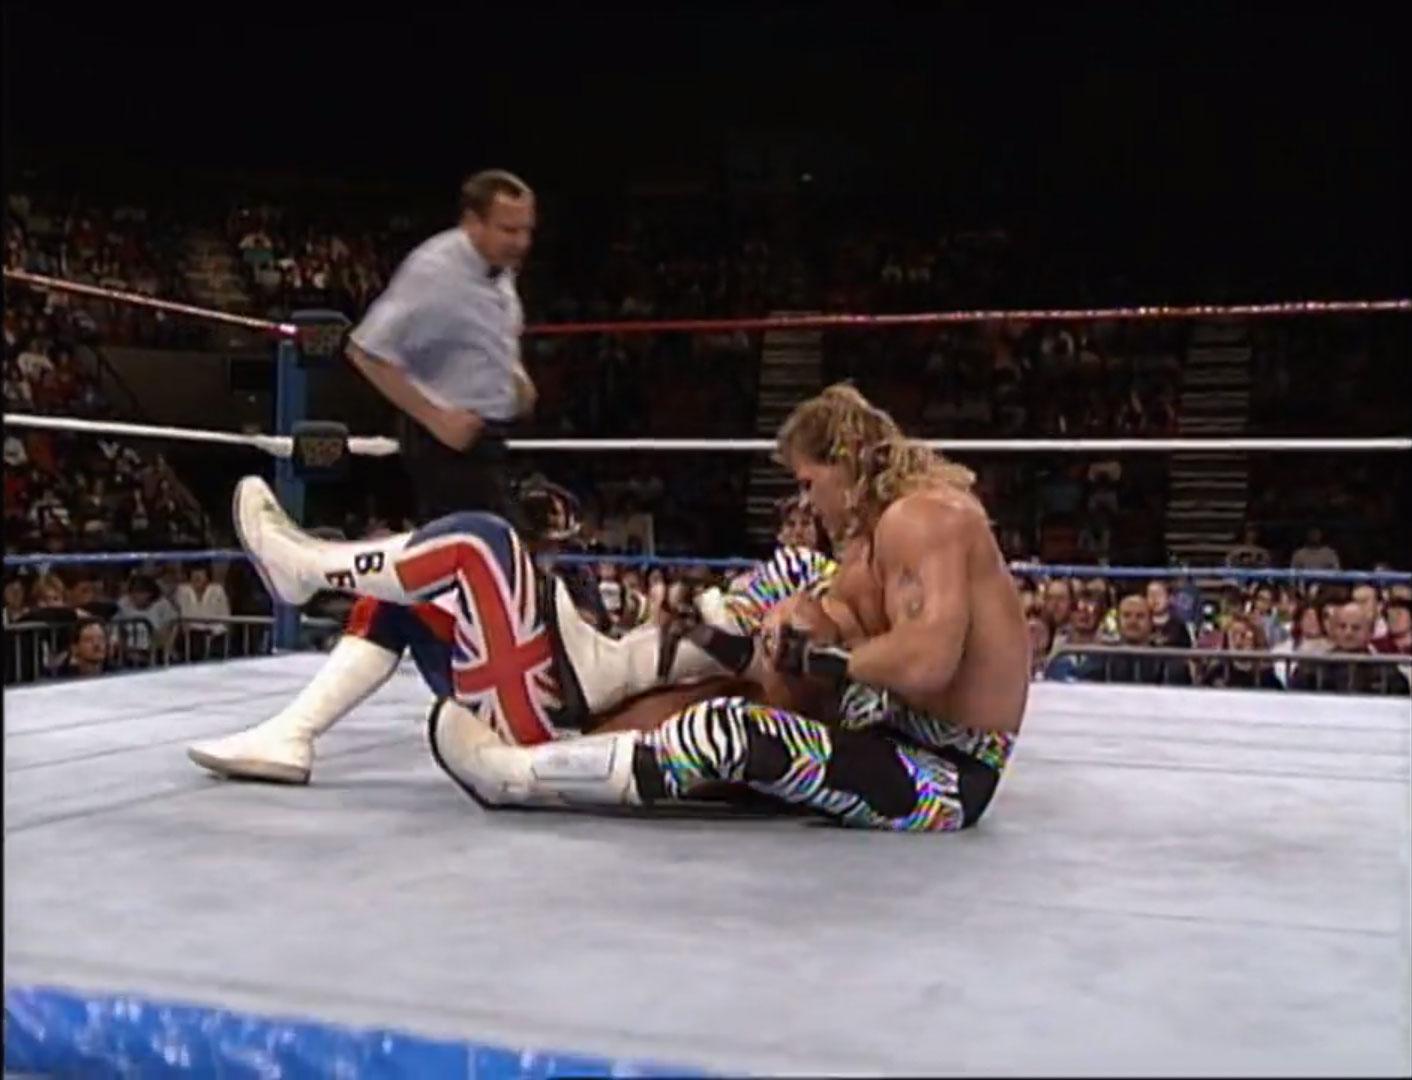 Shawn Michaels vs. The British Bulldog WWF Intercontinental Championship WWF Saturday Night's Main Event, Nov 14th 1992